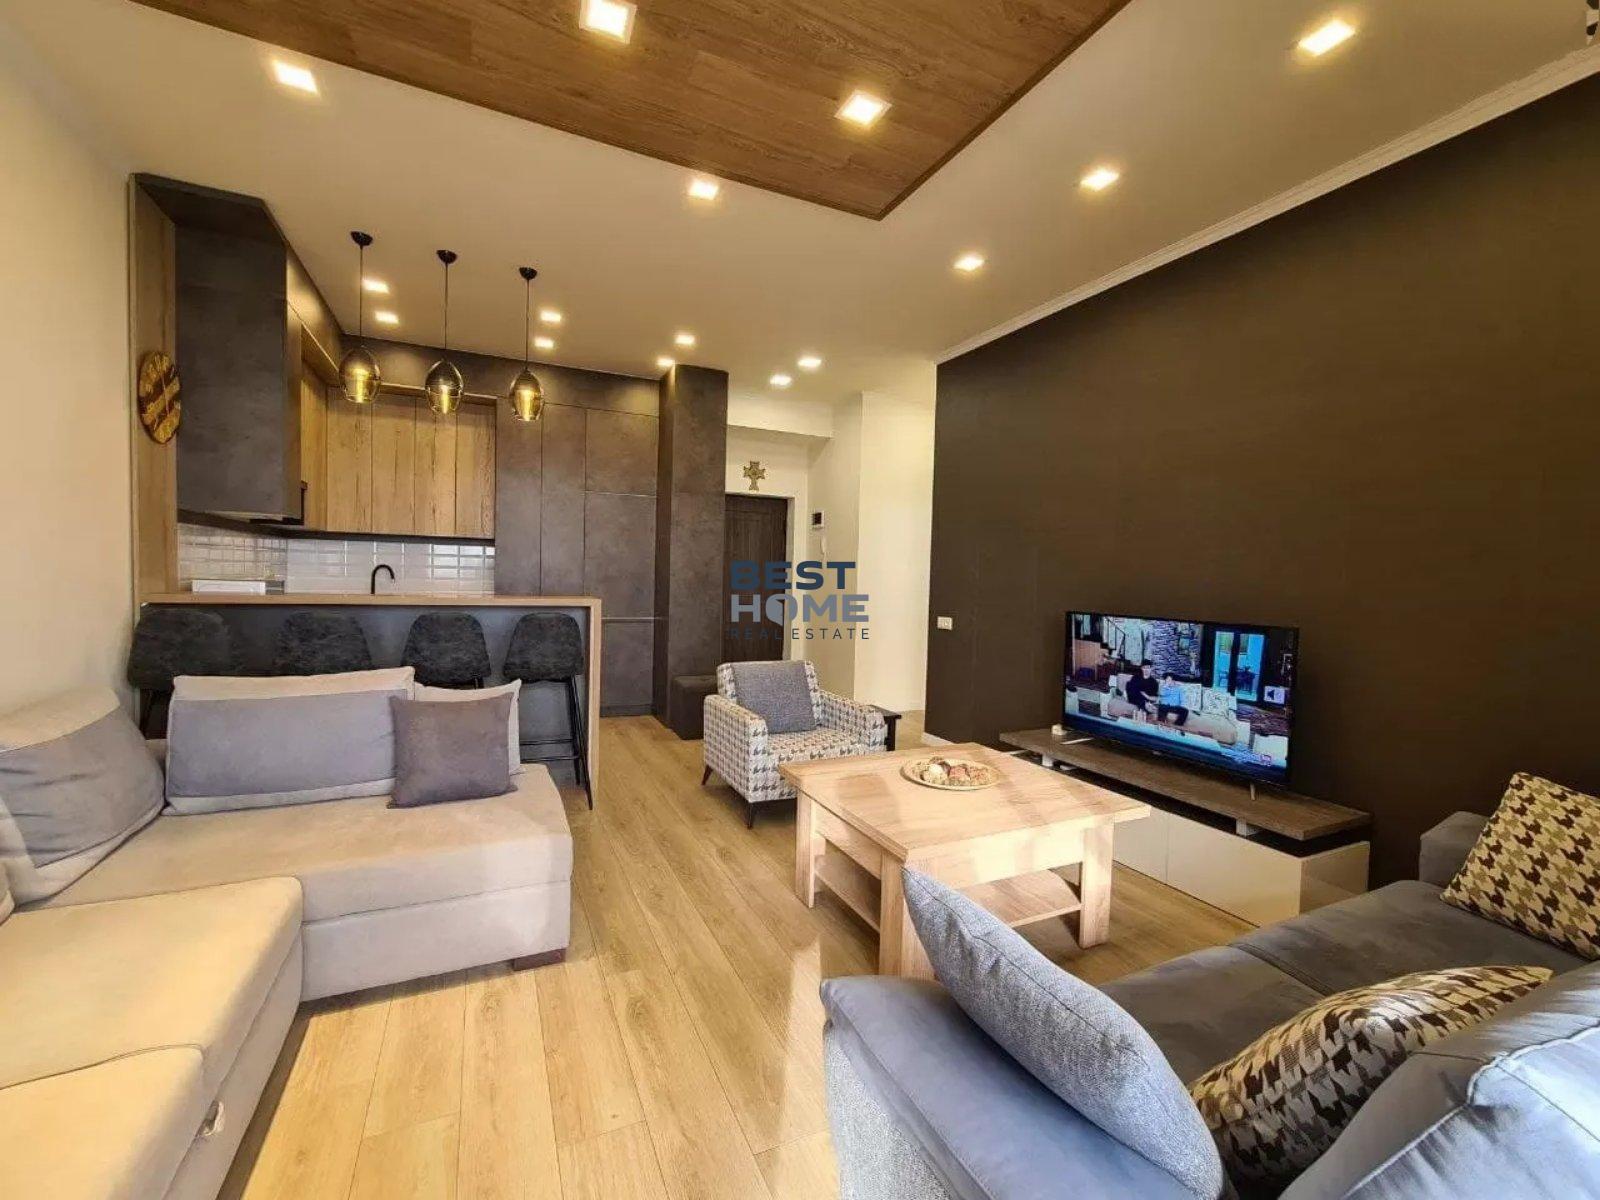 One-bedroom apartment on Yeznik Koghbatsi street